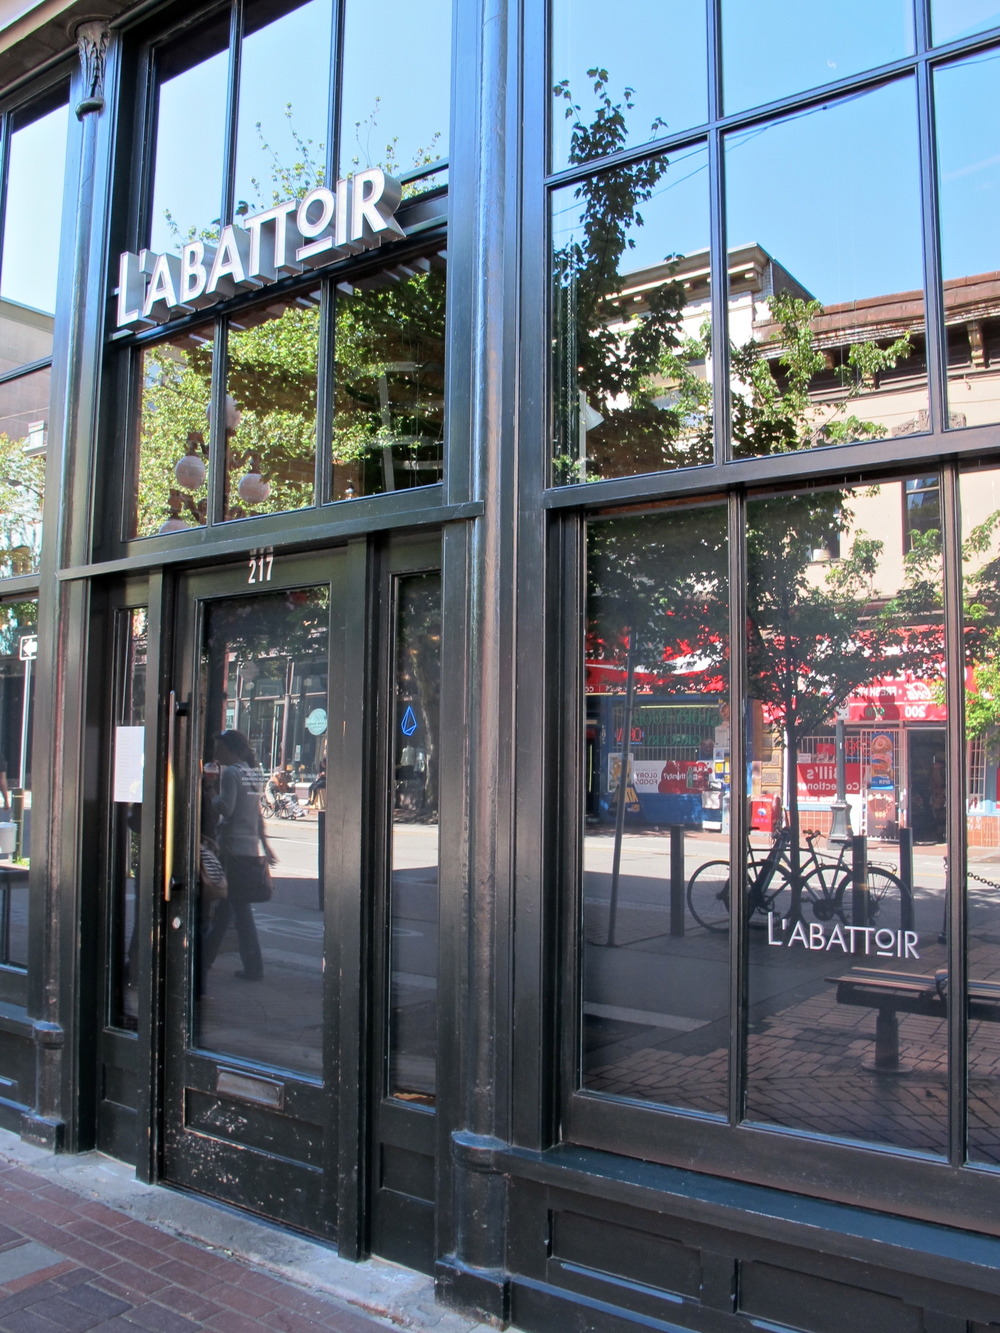 Gastown's L'Abbatoir